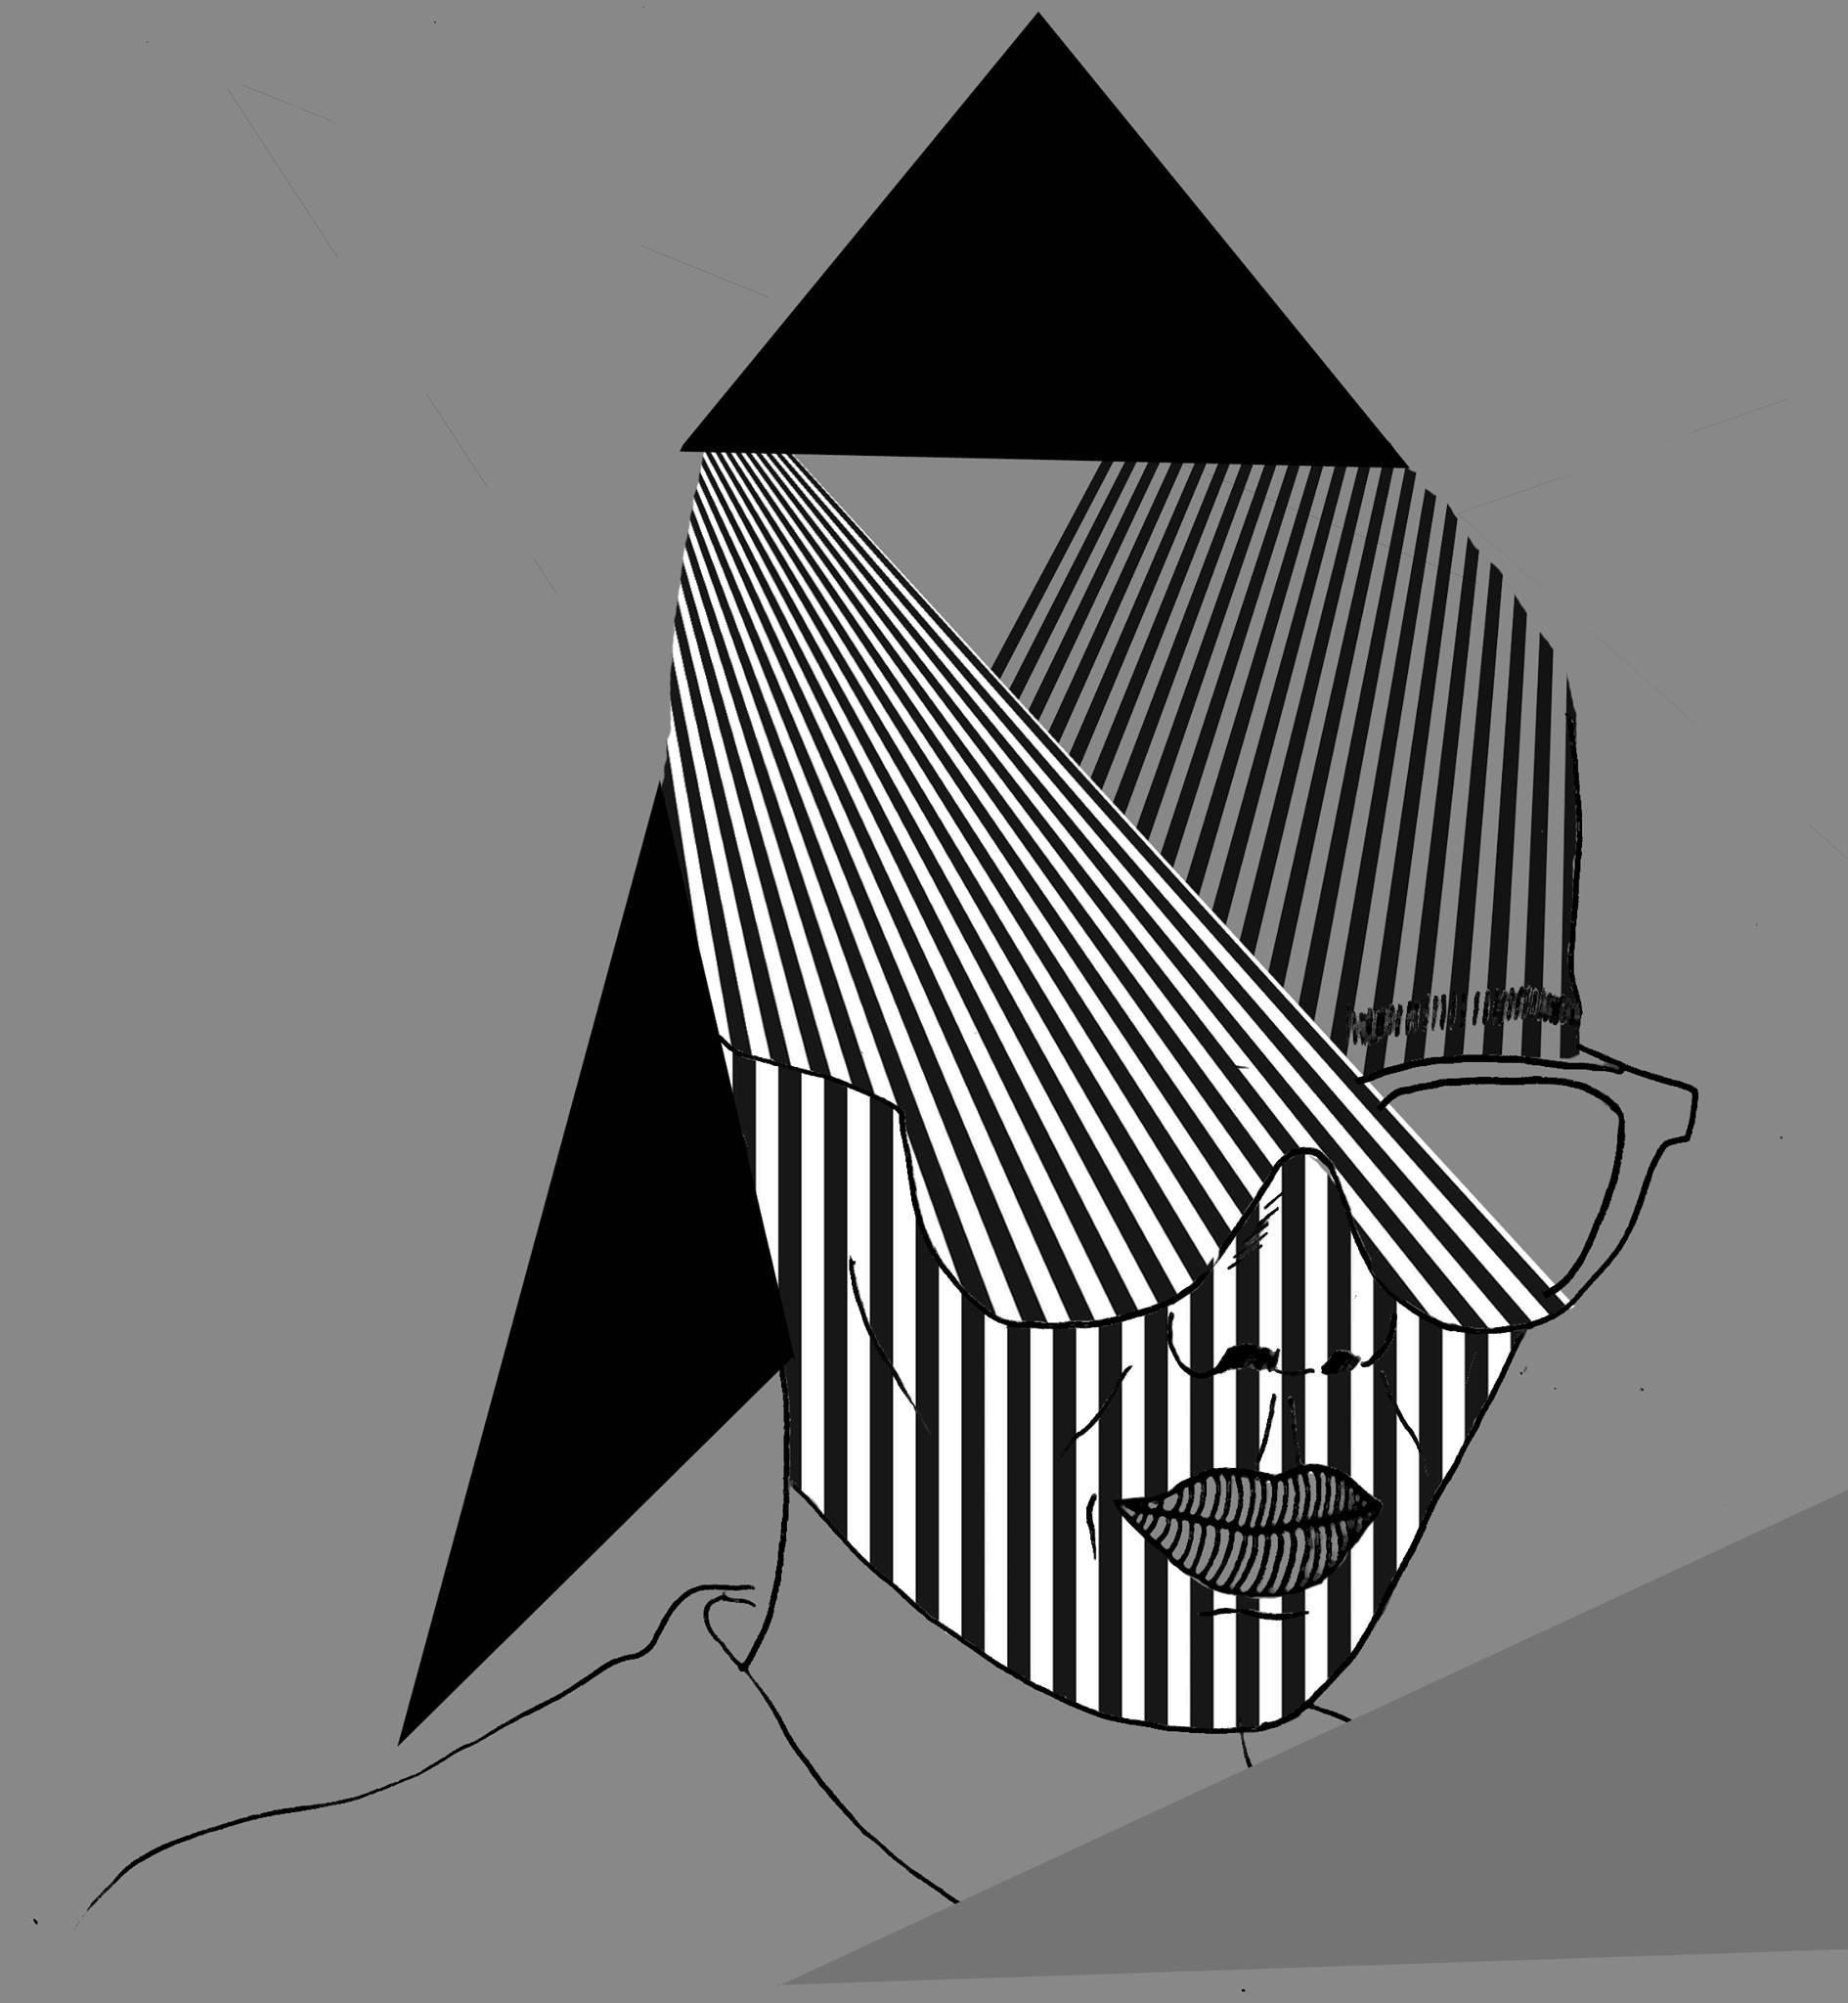 Ai - Vector teikningar